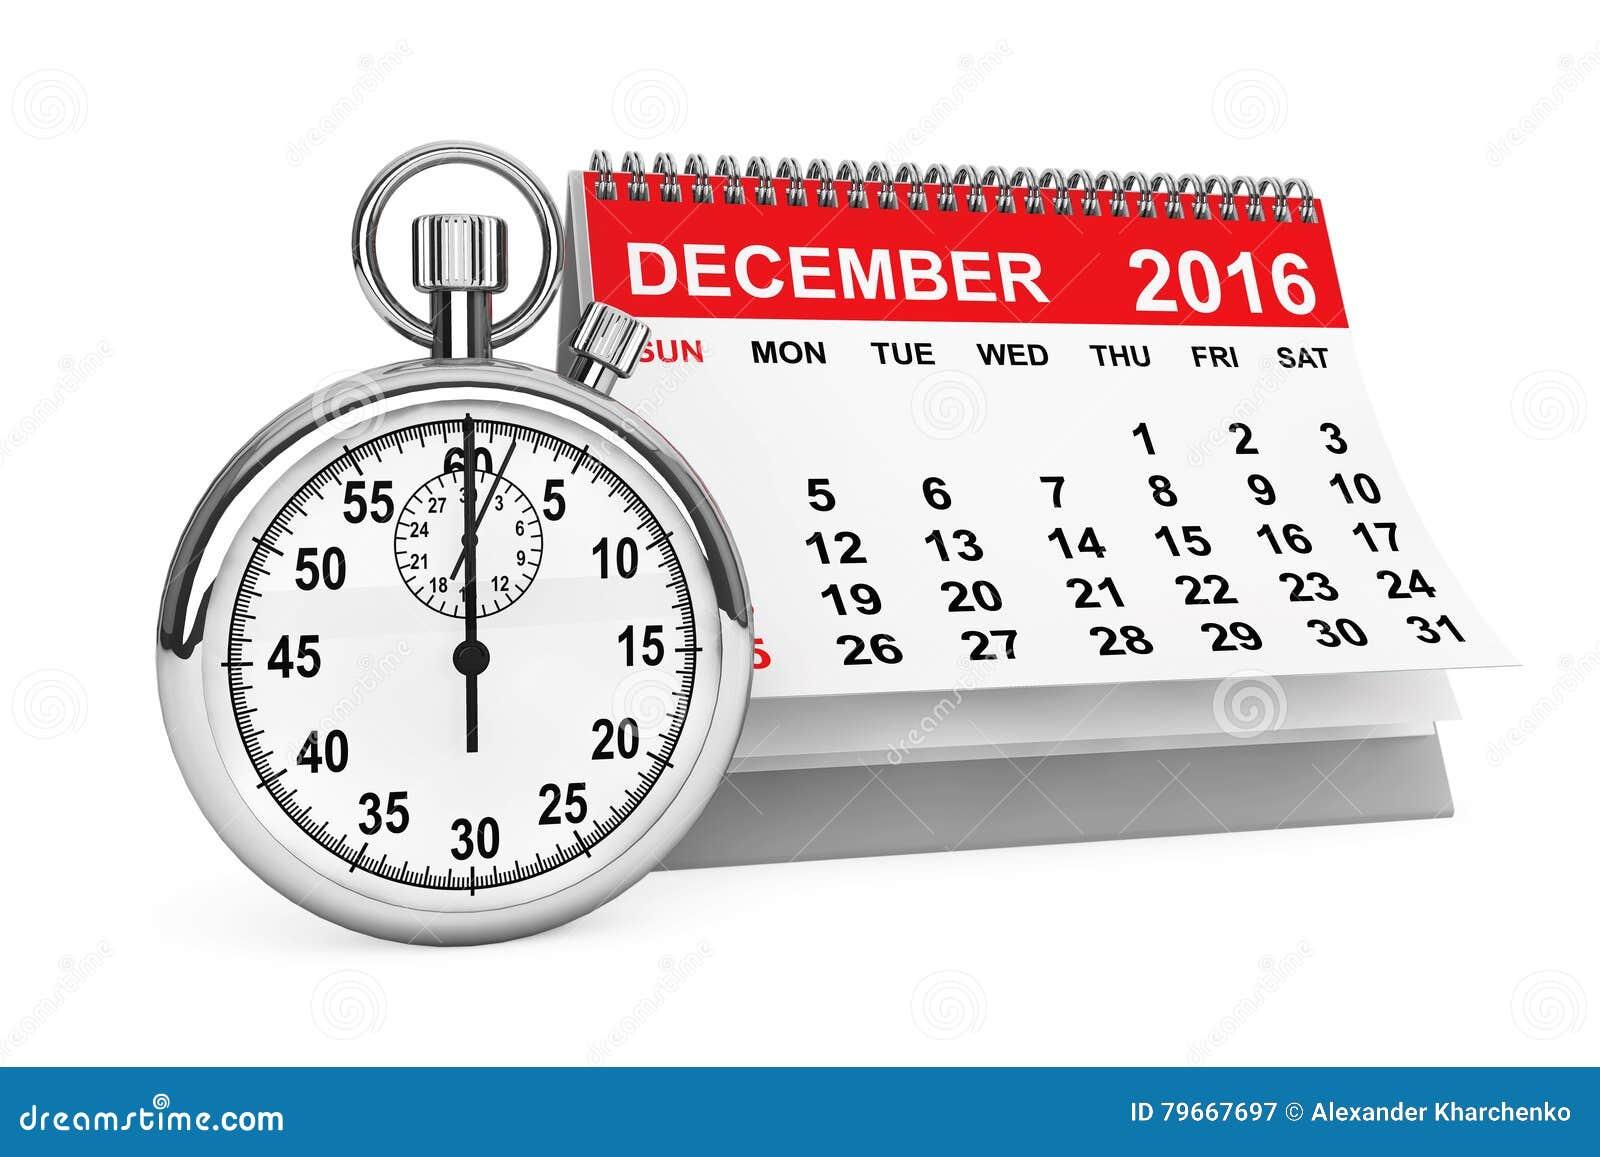 En diciembre de 2016 calendario con el cronómetro representación 3d